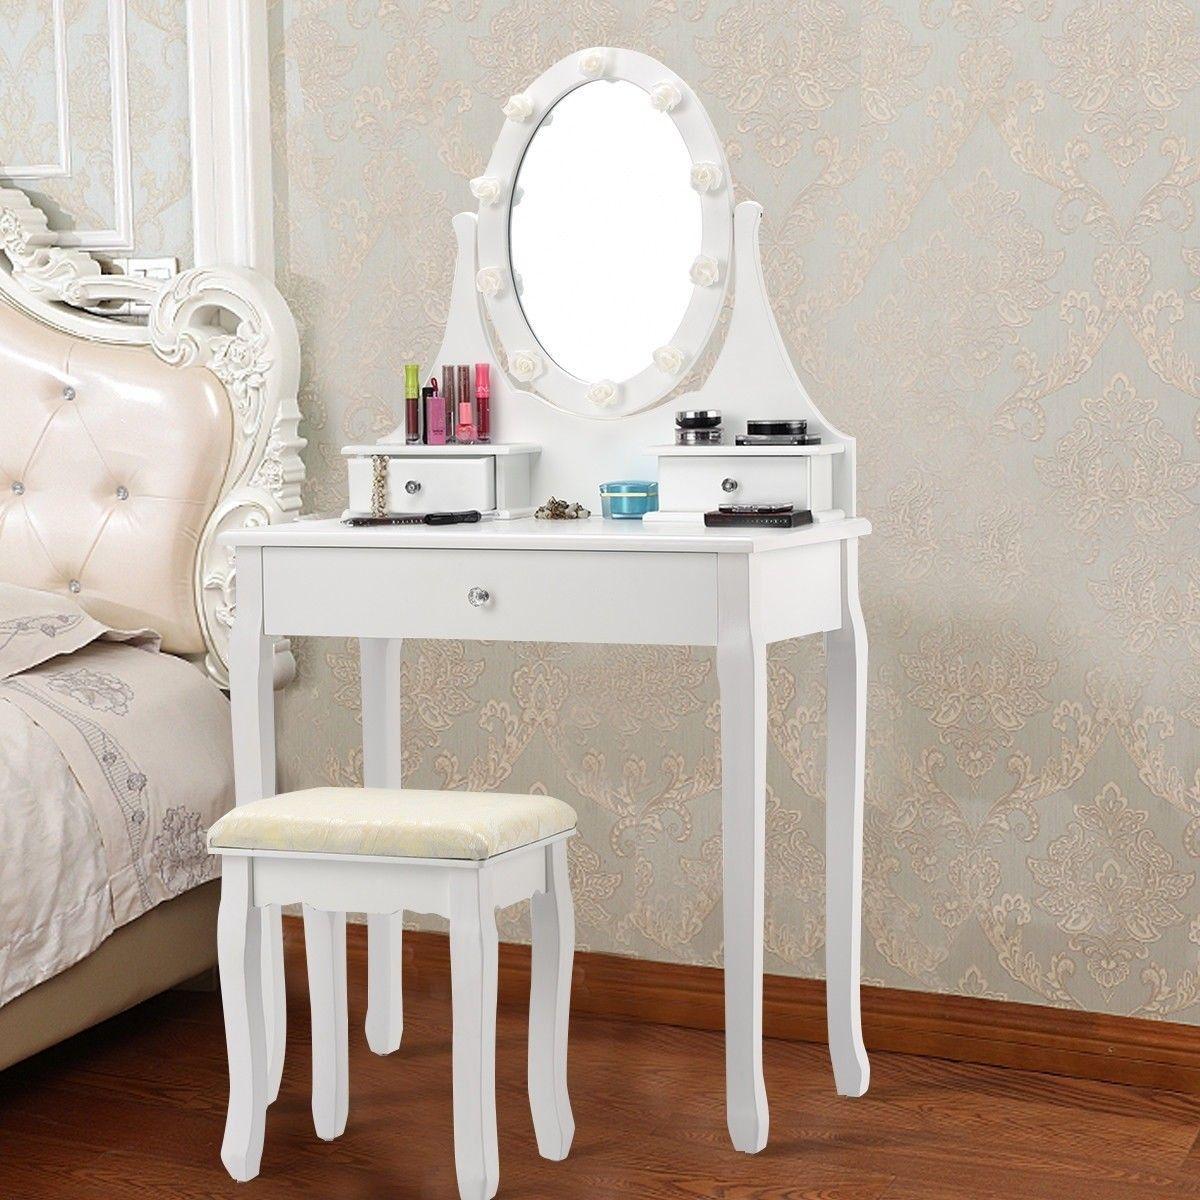 Strange 3 Drawers Lighted Mirror Vanity Makeup Dressing Table Stool Dailytribune Chair Design For Home Dailytribuneorg